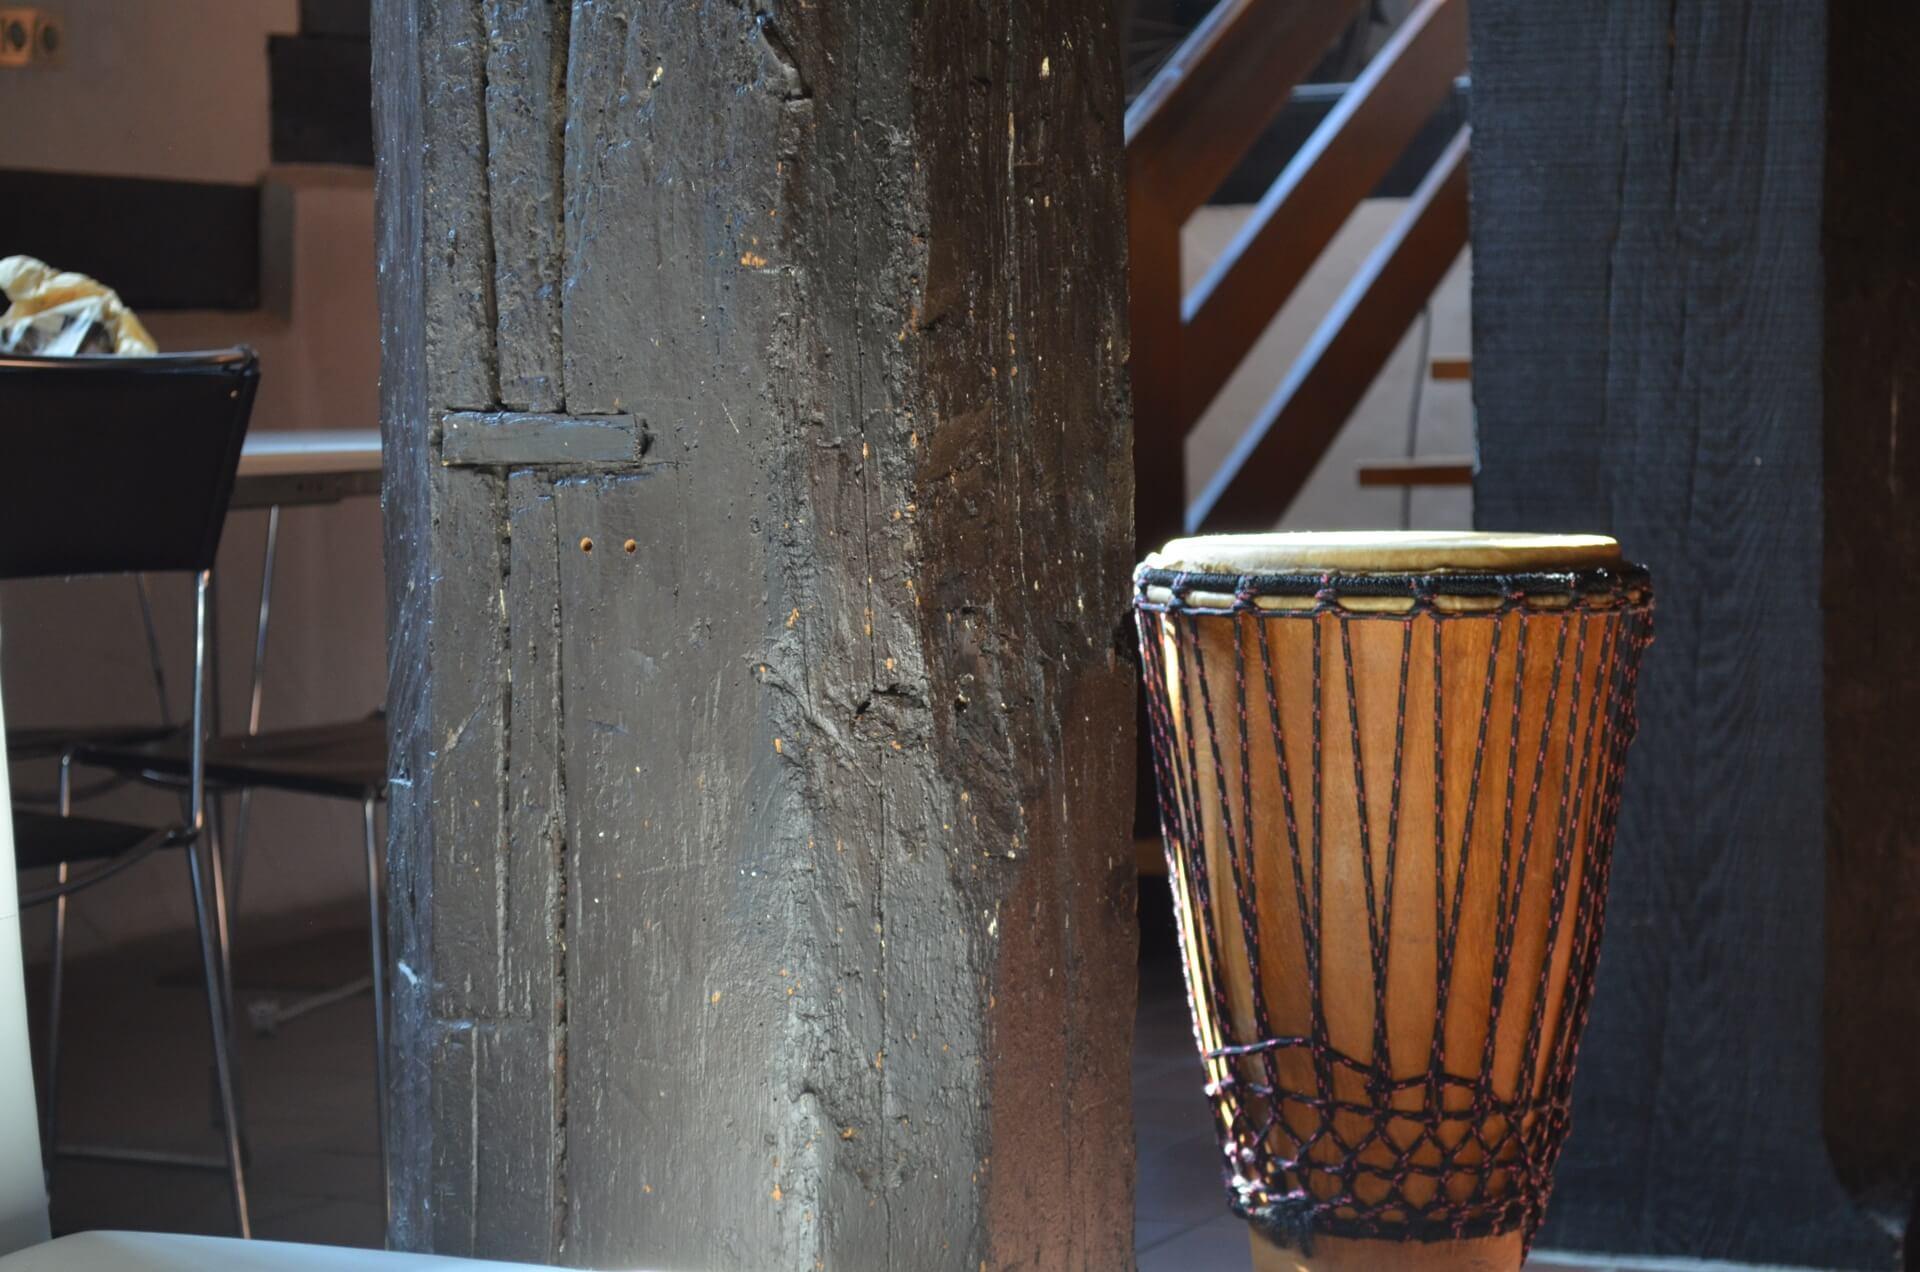 Trommel, Historischer Ochsenkopf